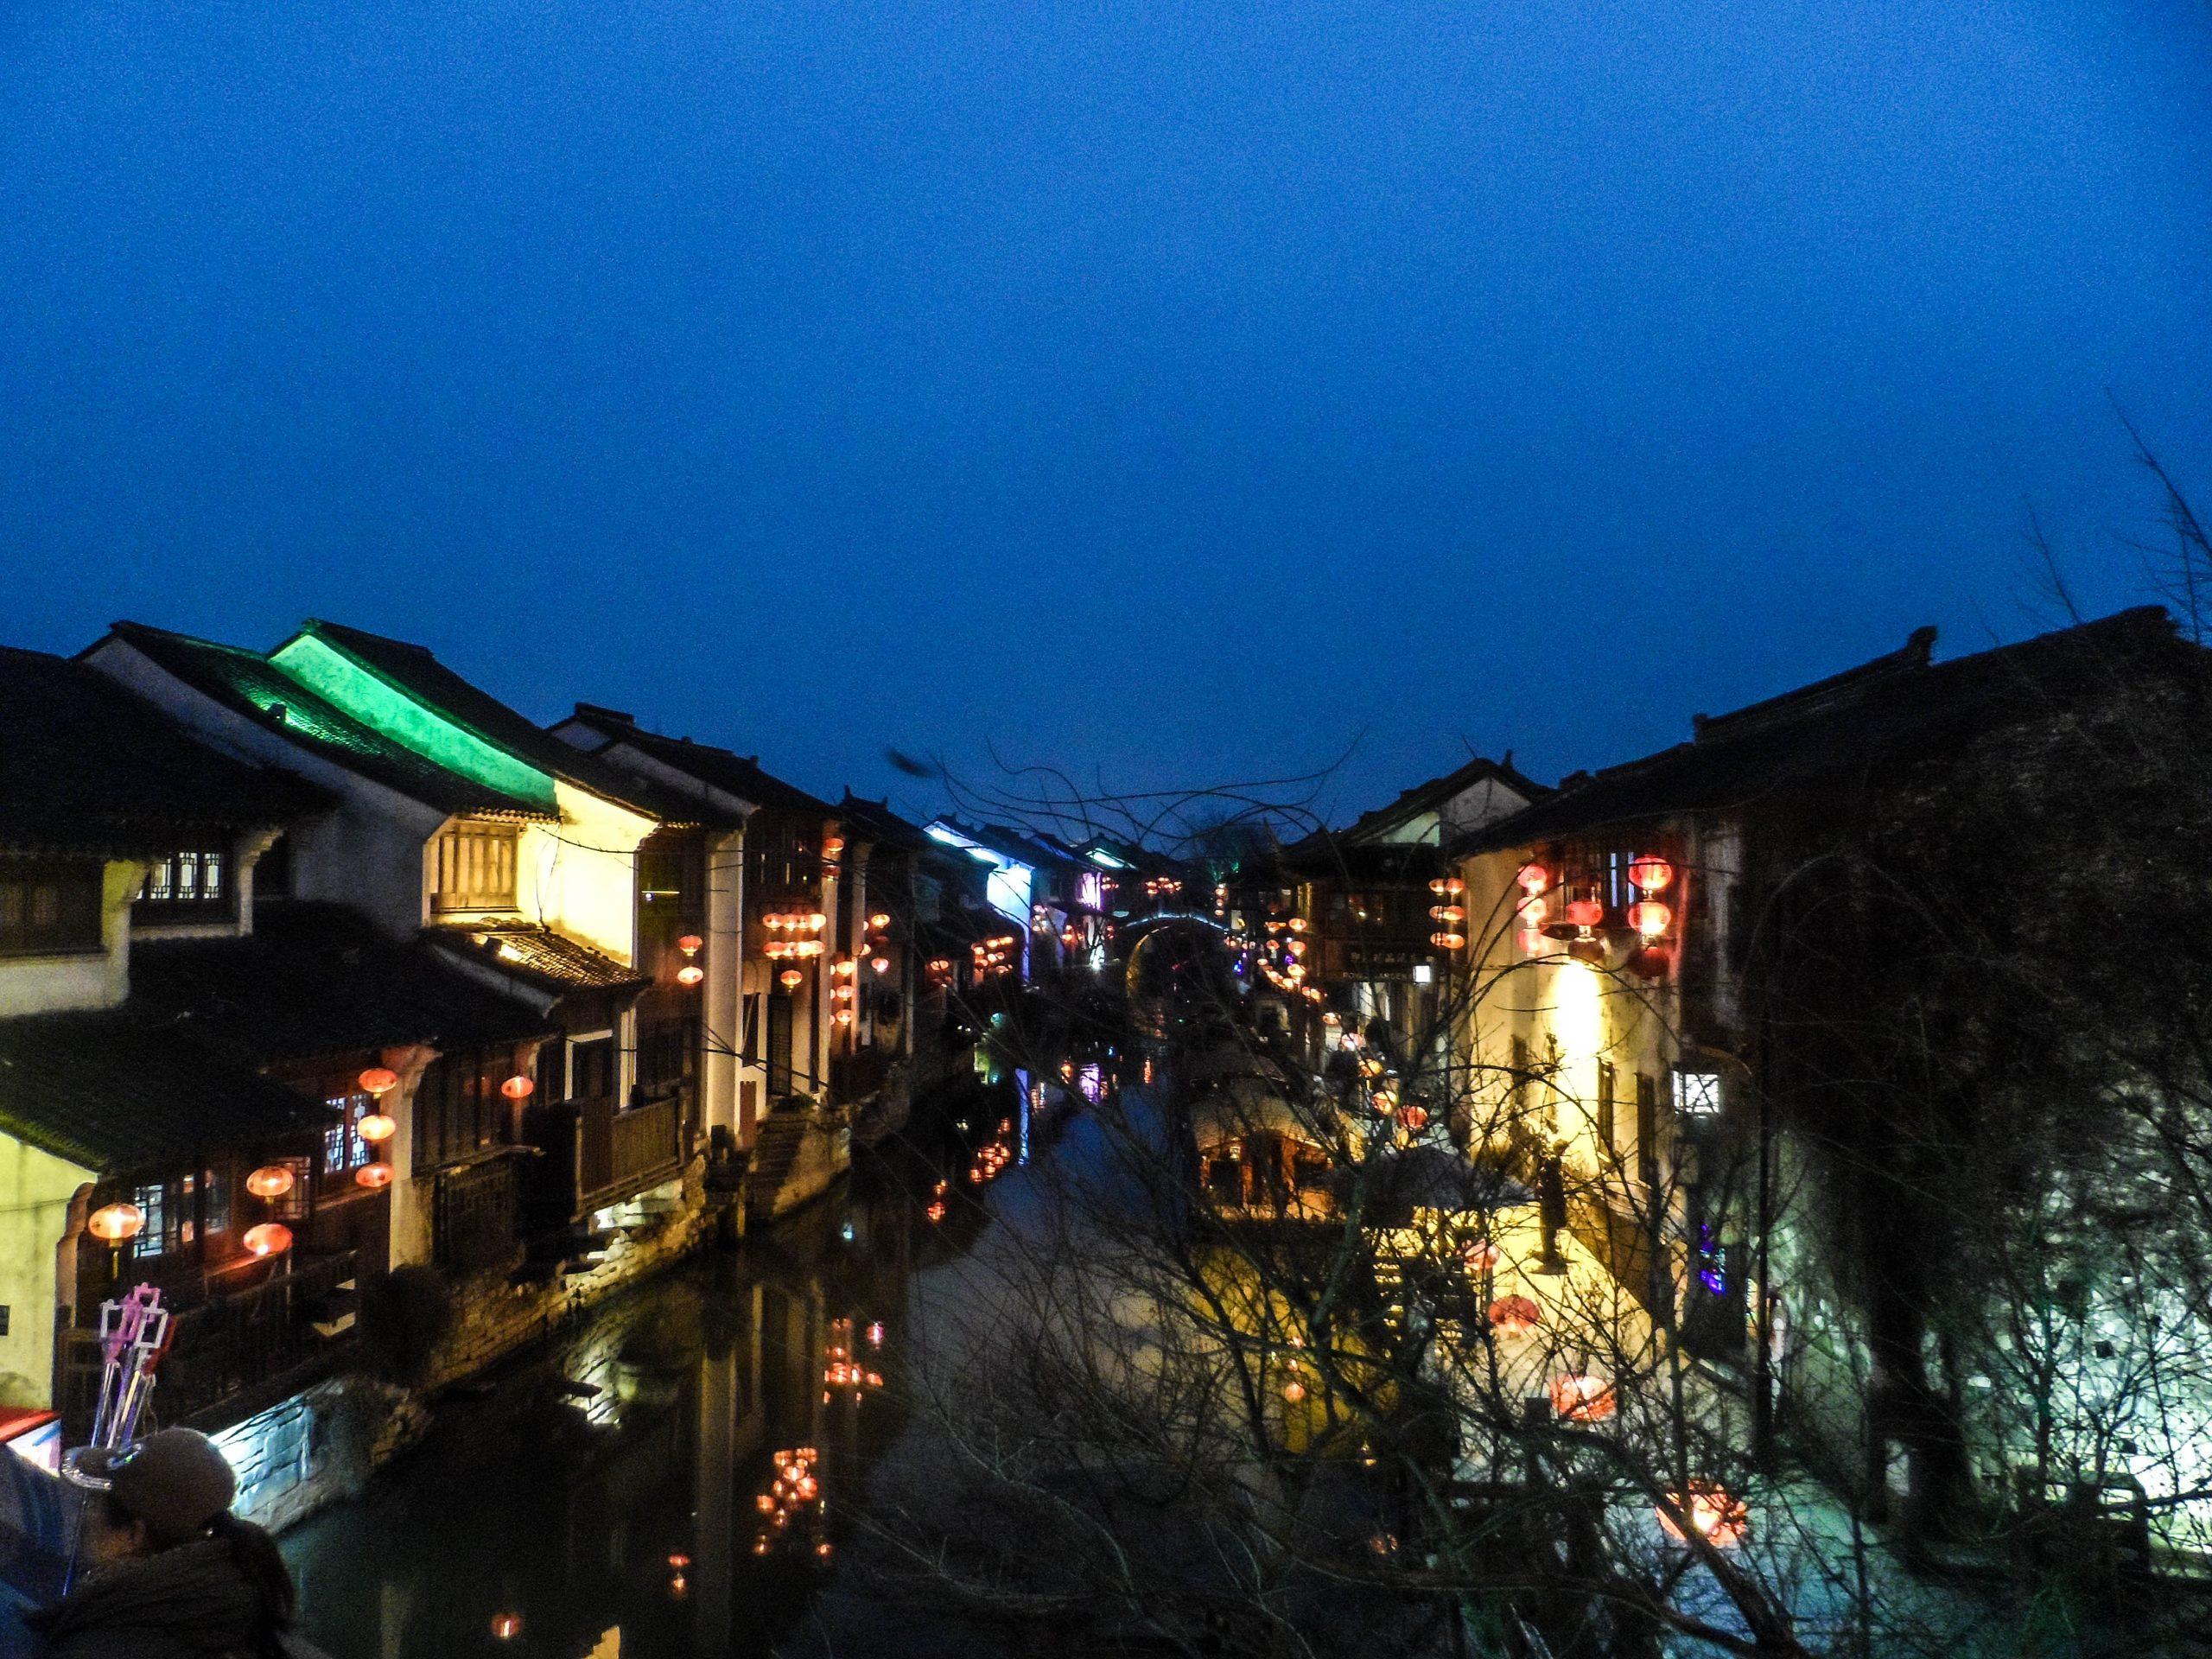 Suzhou canal night